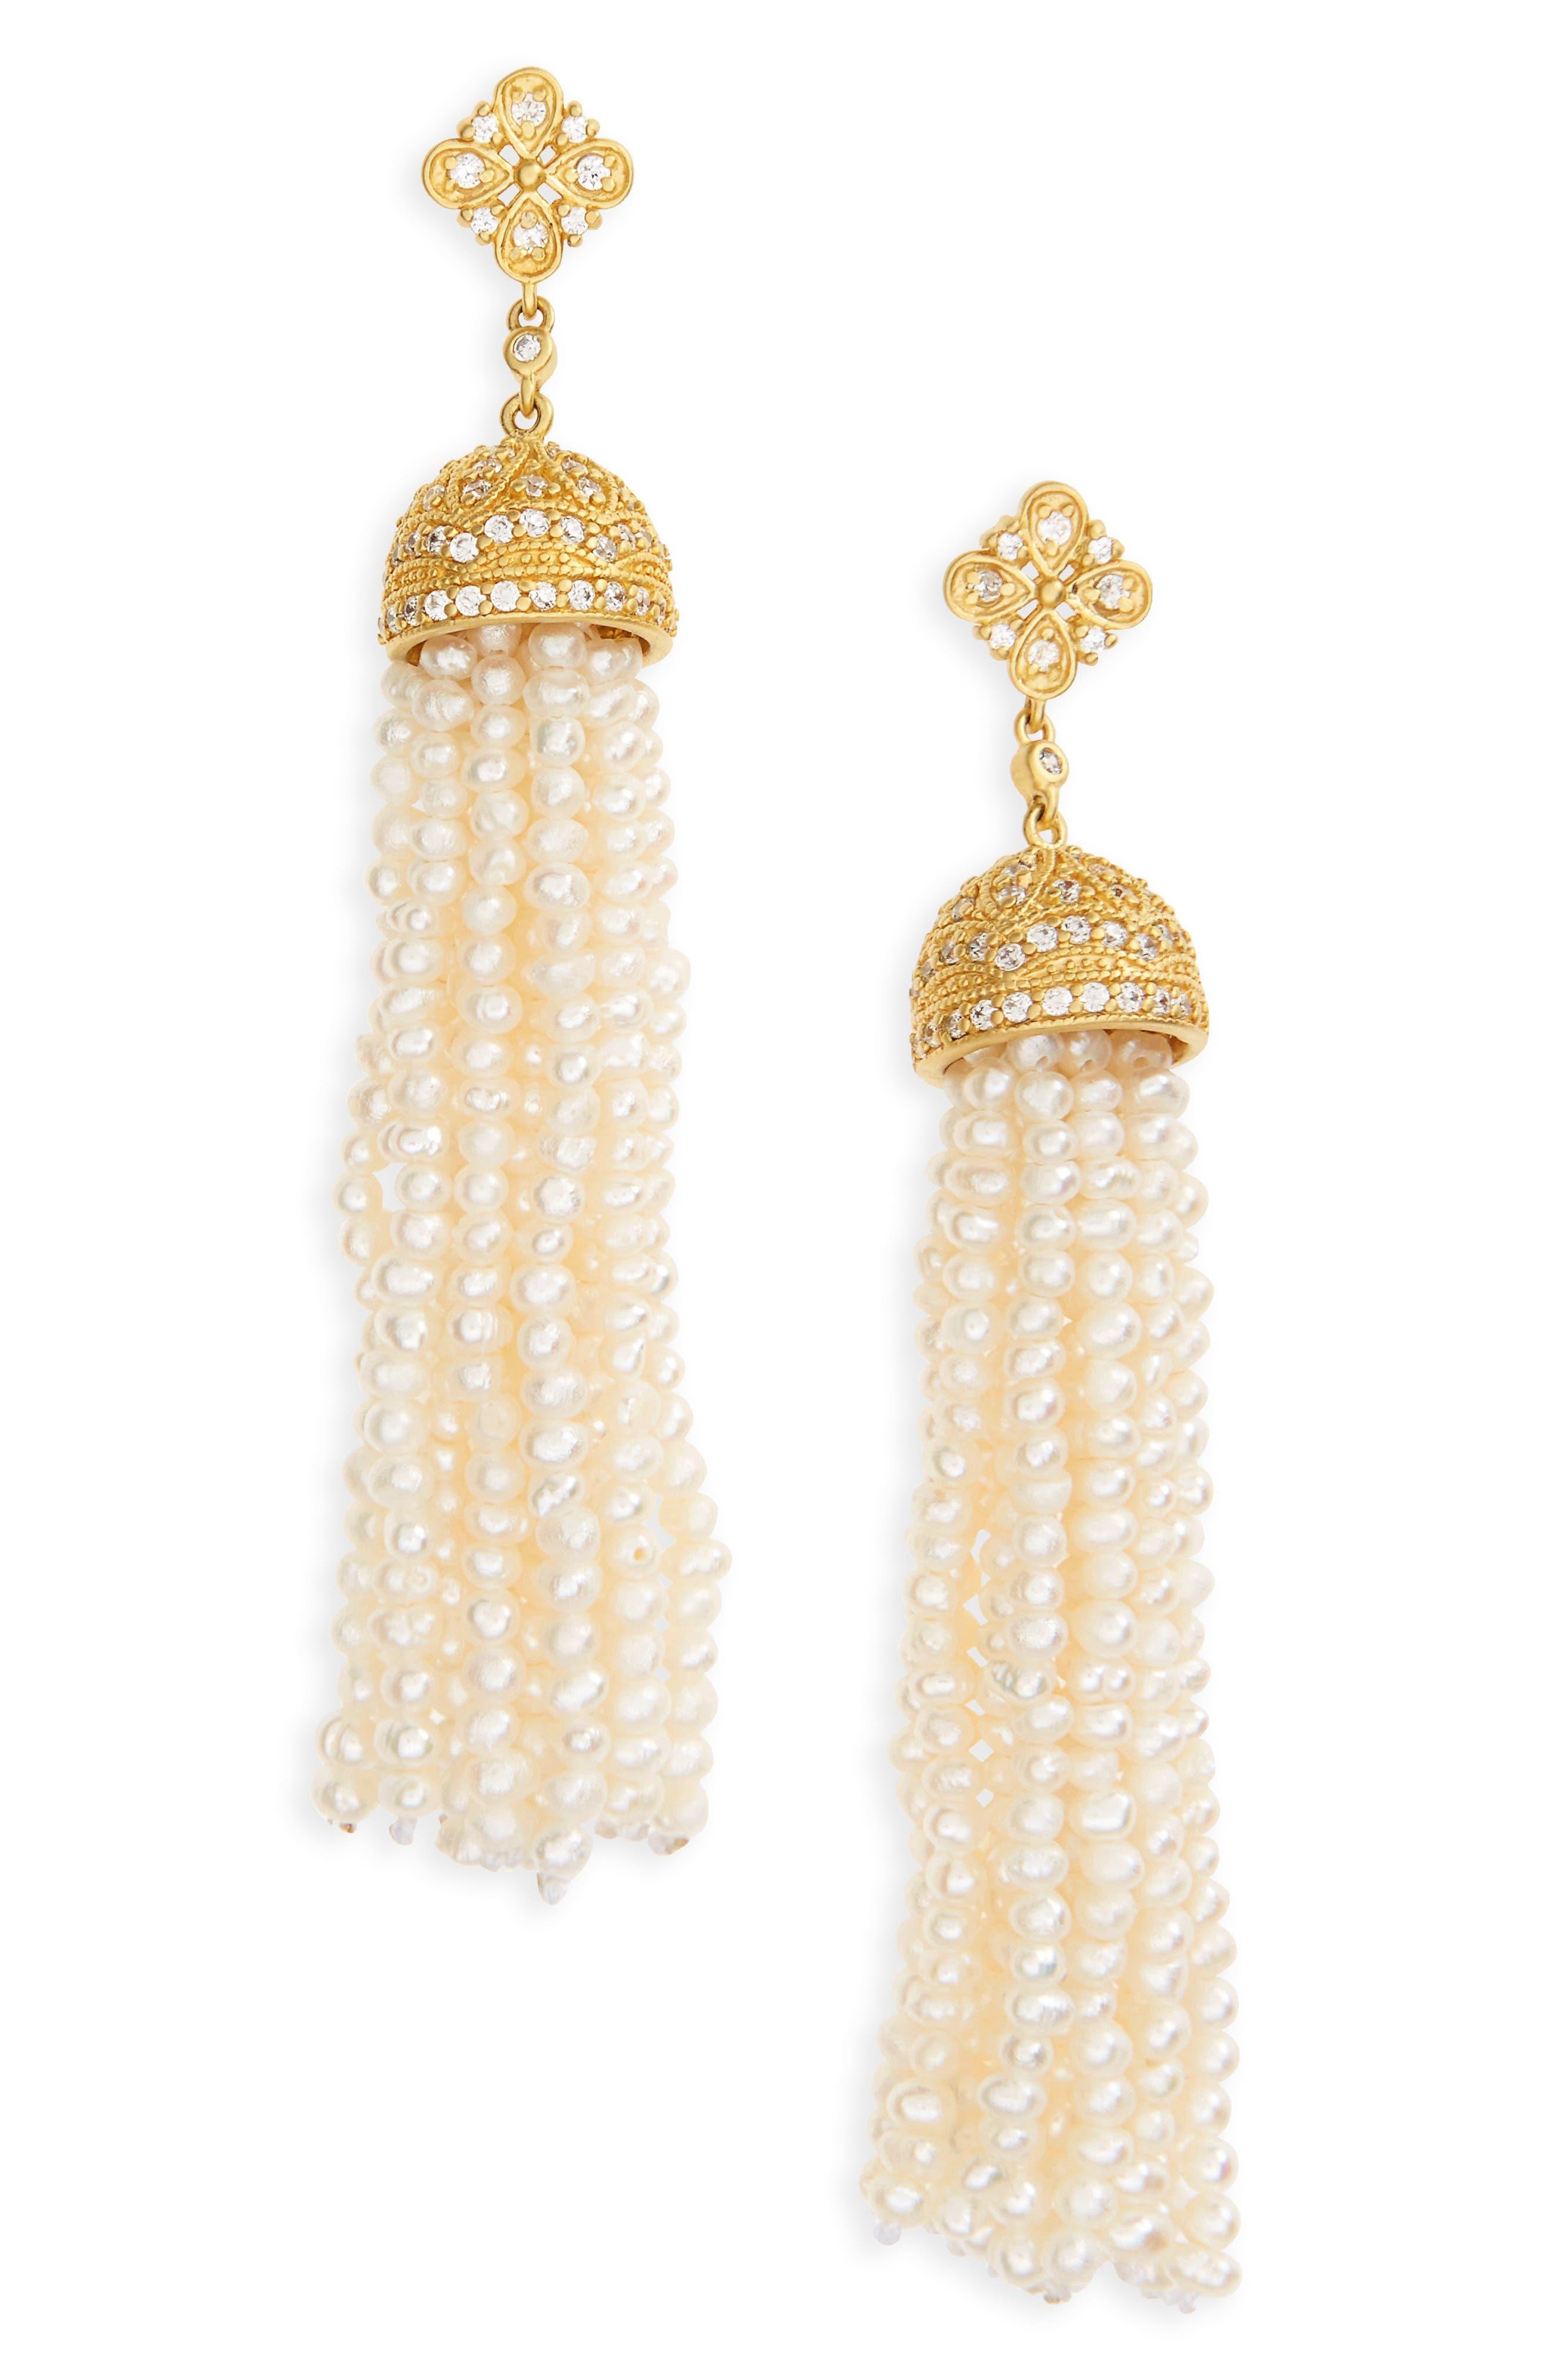 Audrey Waterfall Tassel Pearl Earrings,                             Main thumbnail 1, color,                             Gold/ Pearl